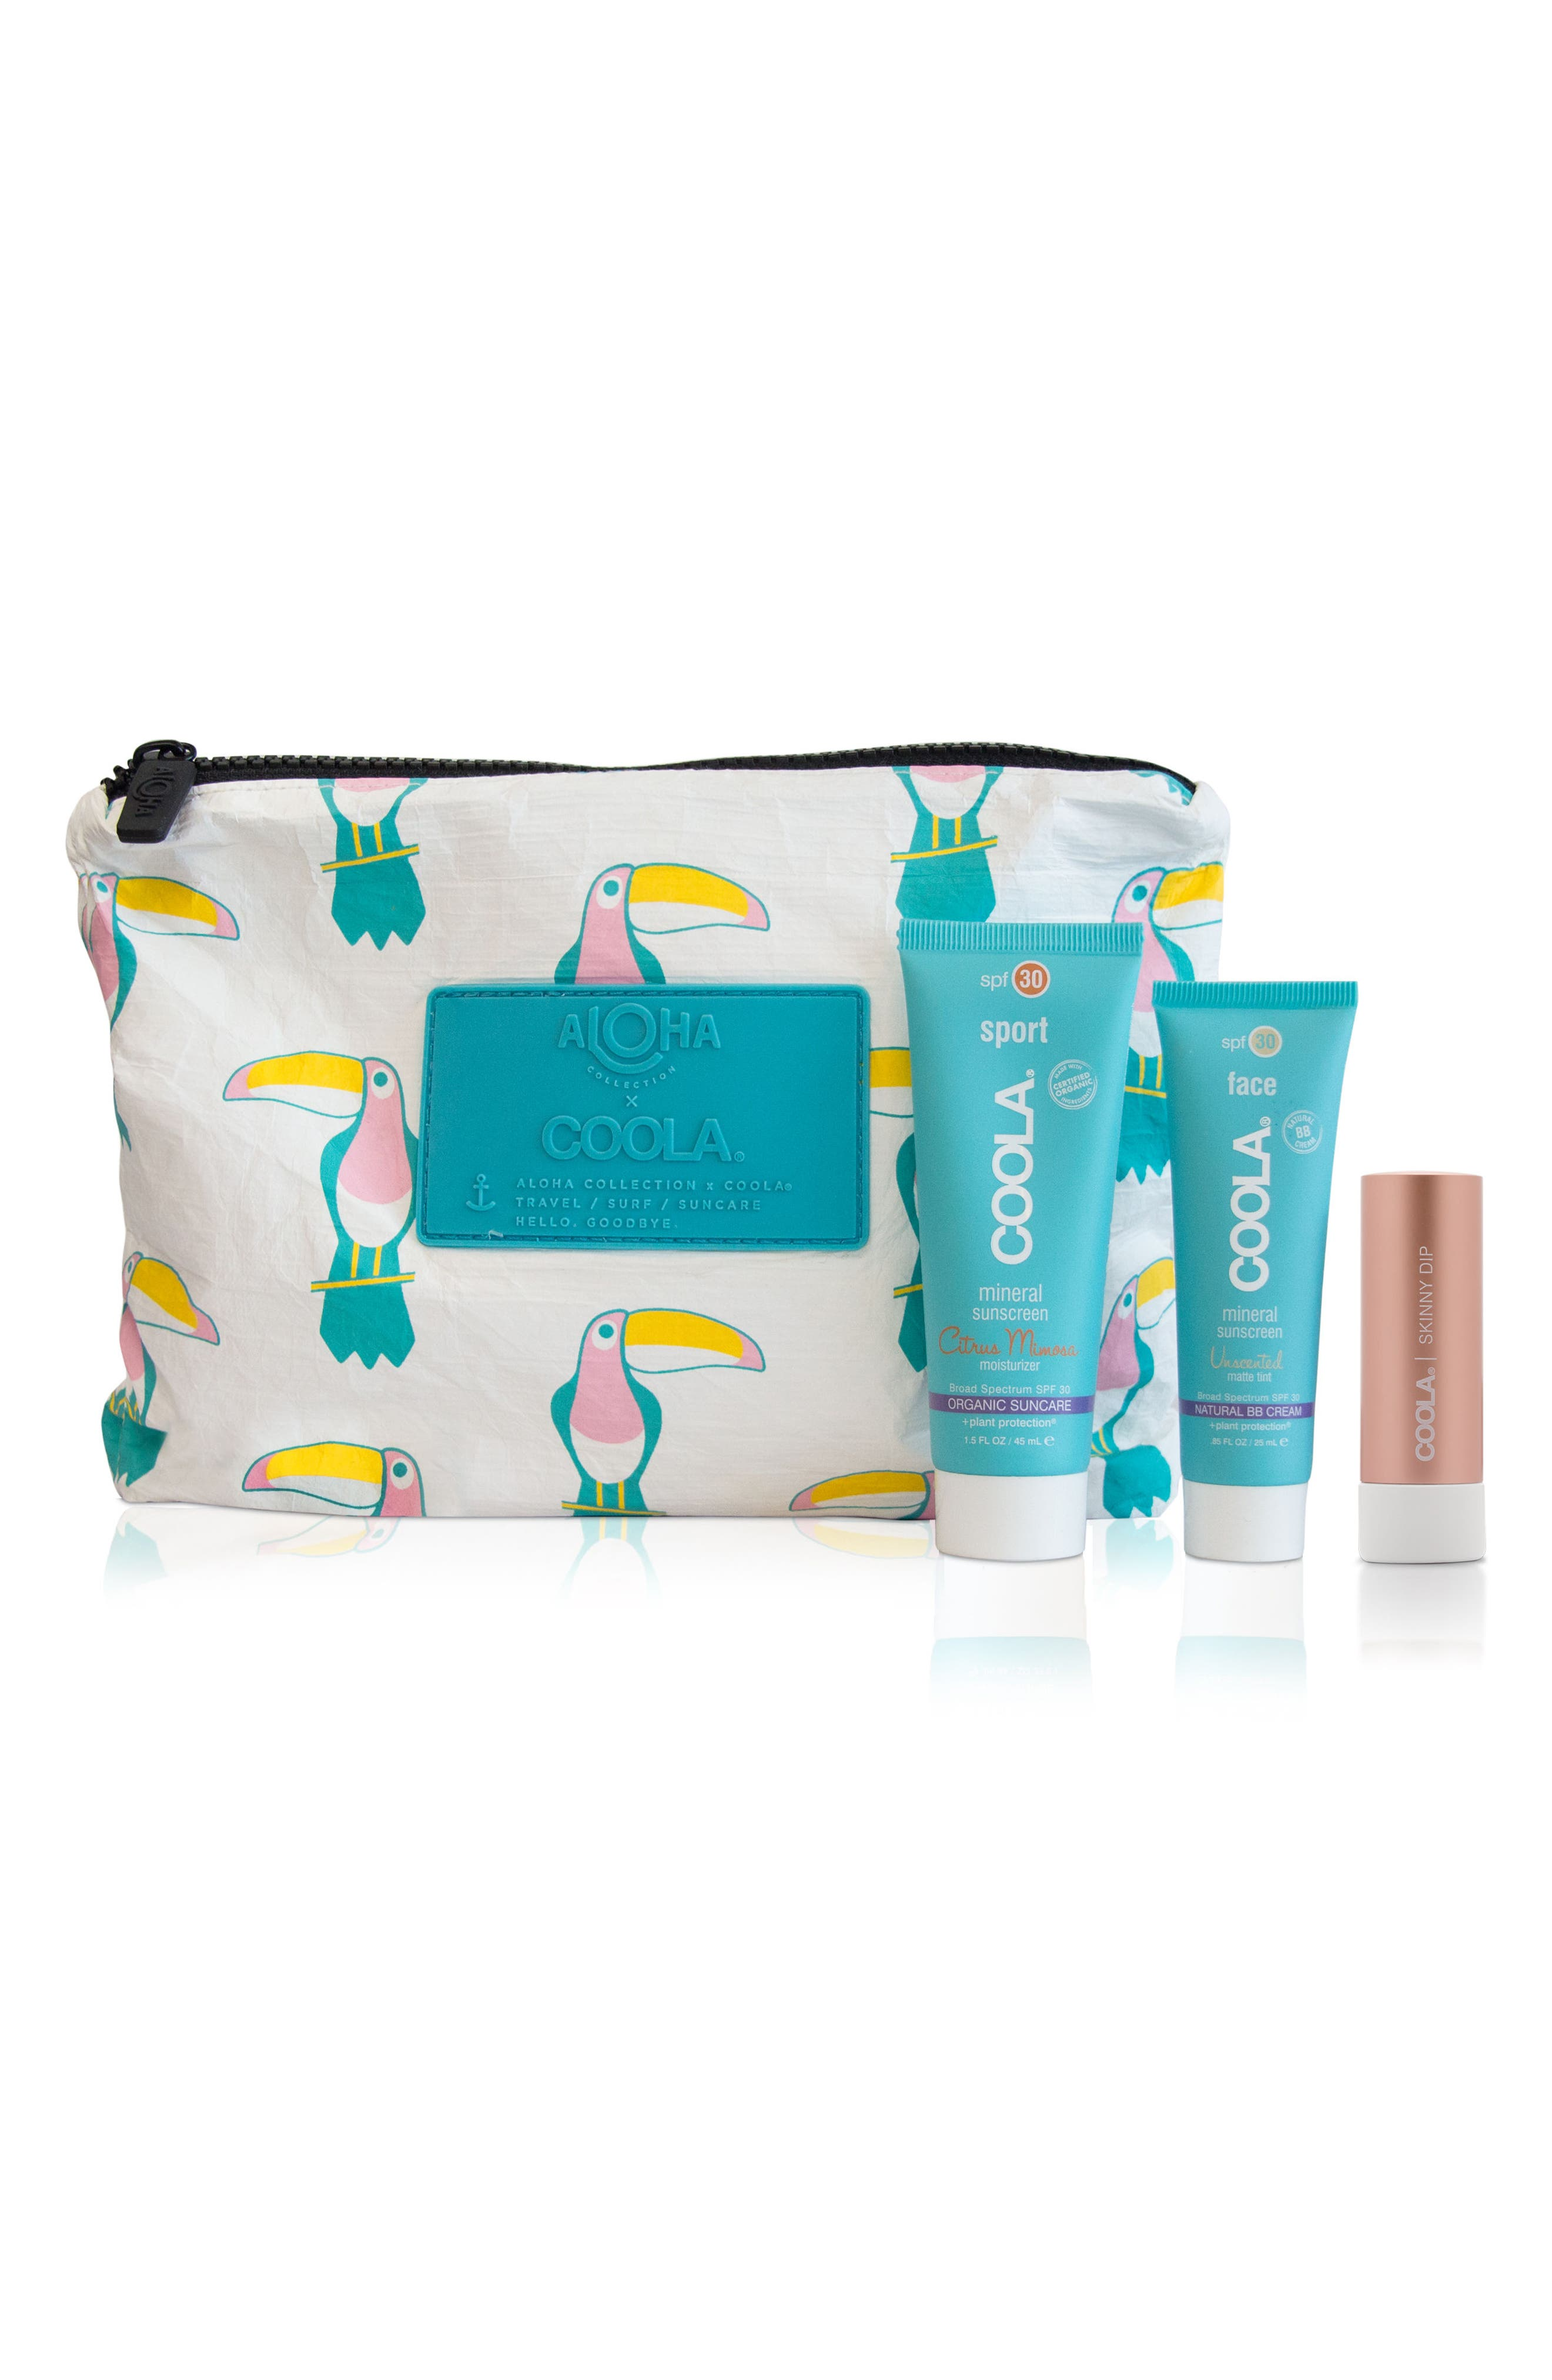 COOLA<sup>®</sup> Suncare x ALOHA Travel Set,                             Main thumbnail 1, color,                             000